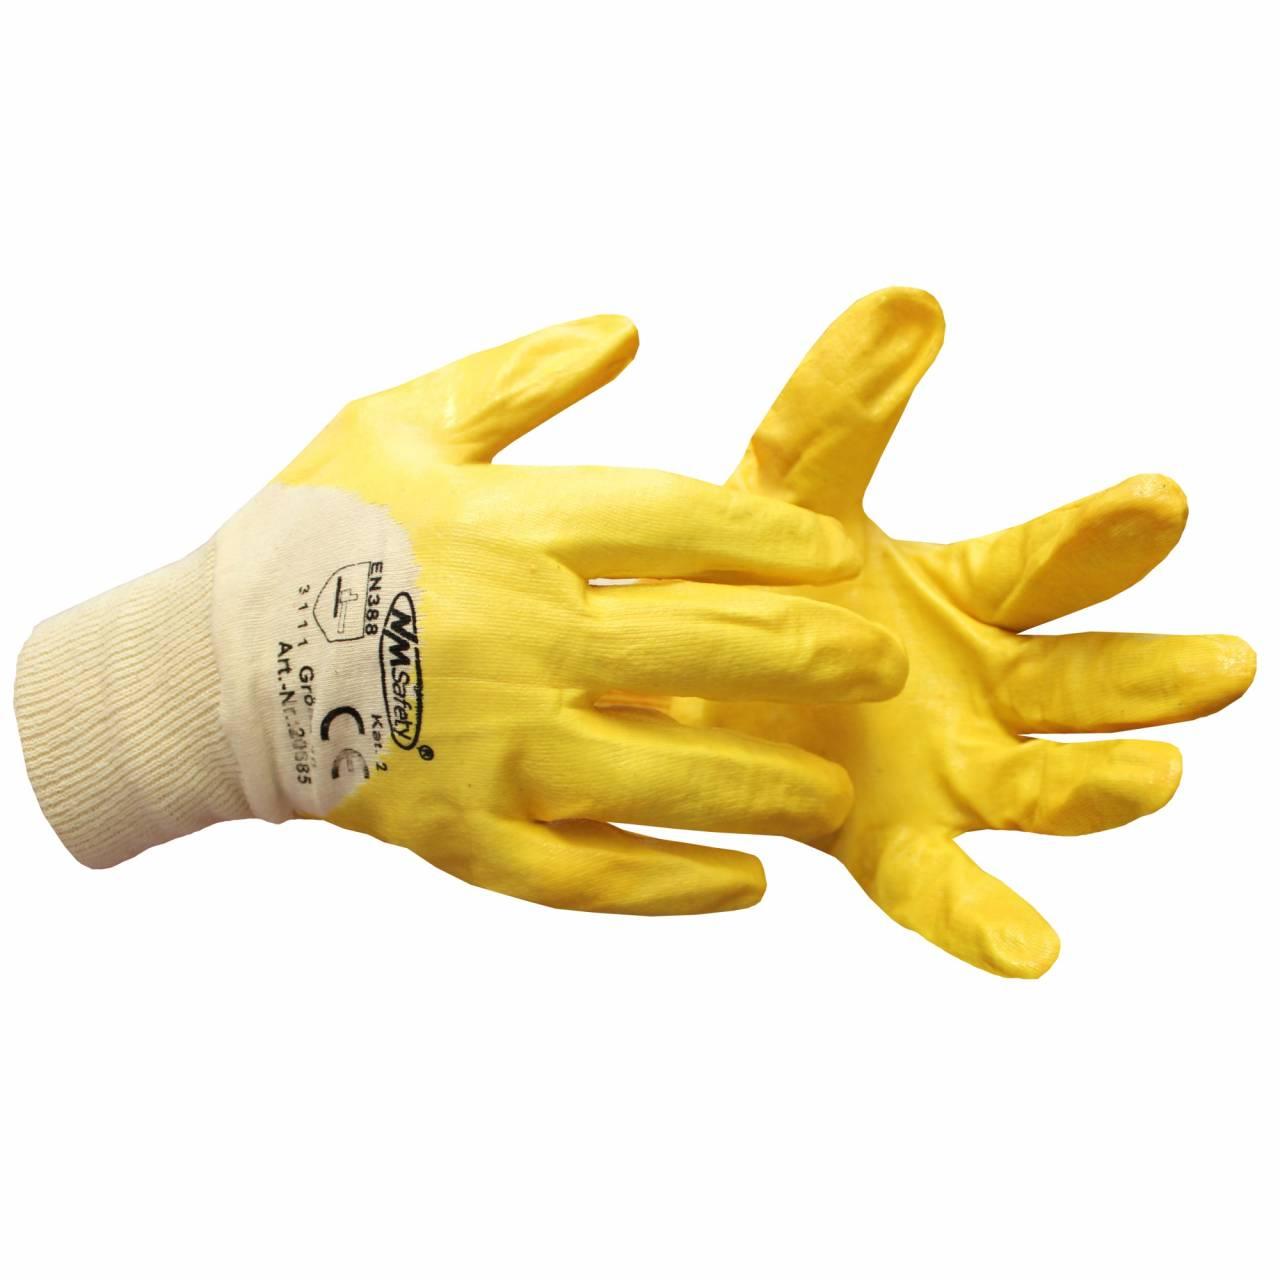 Nitril-Handschuhe Gr. 8, gelb, BW-Gewebe, EN388 Kat.2 / Paar